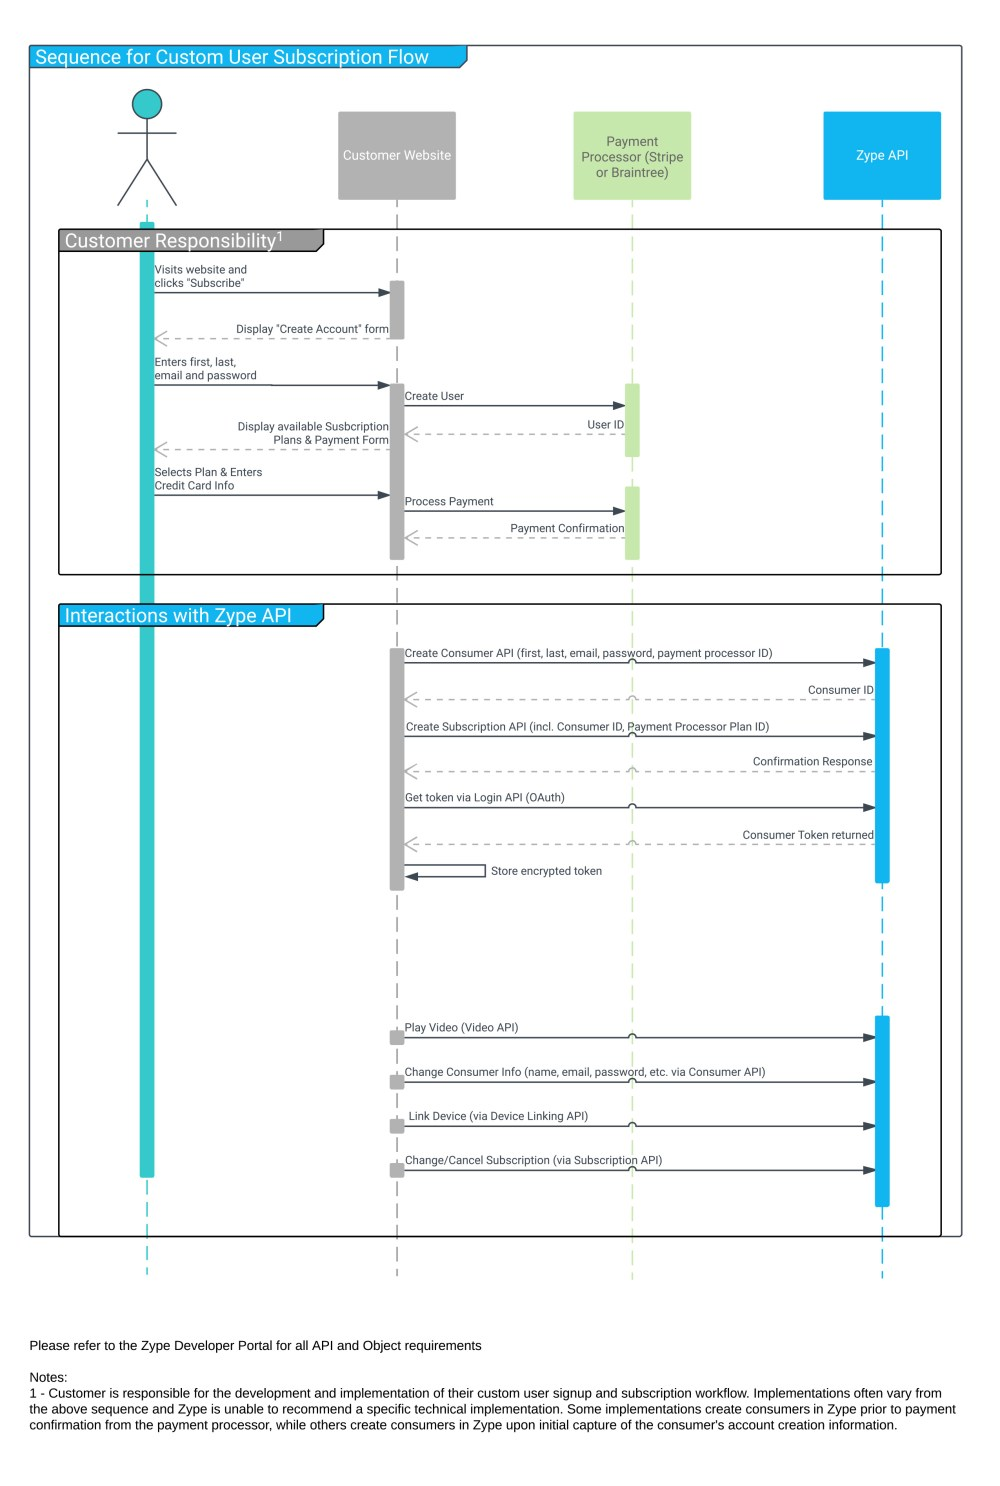 medium resolution of sequencediagramforcustomerusersubscriptionflow jpg